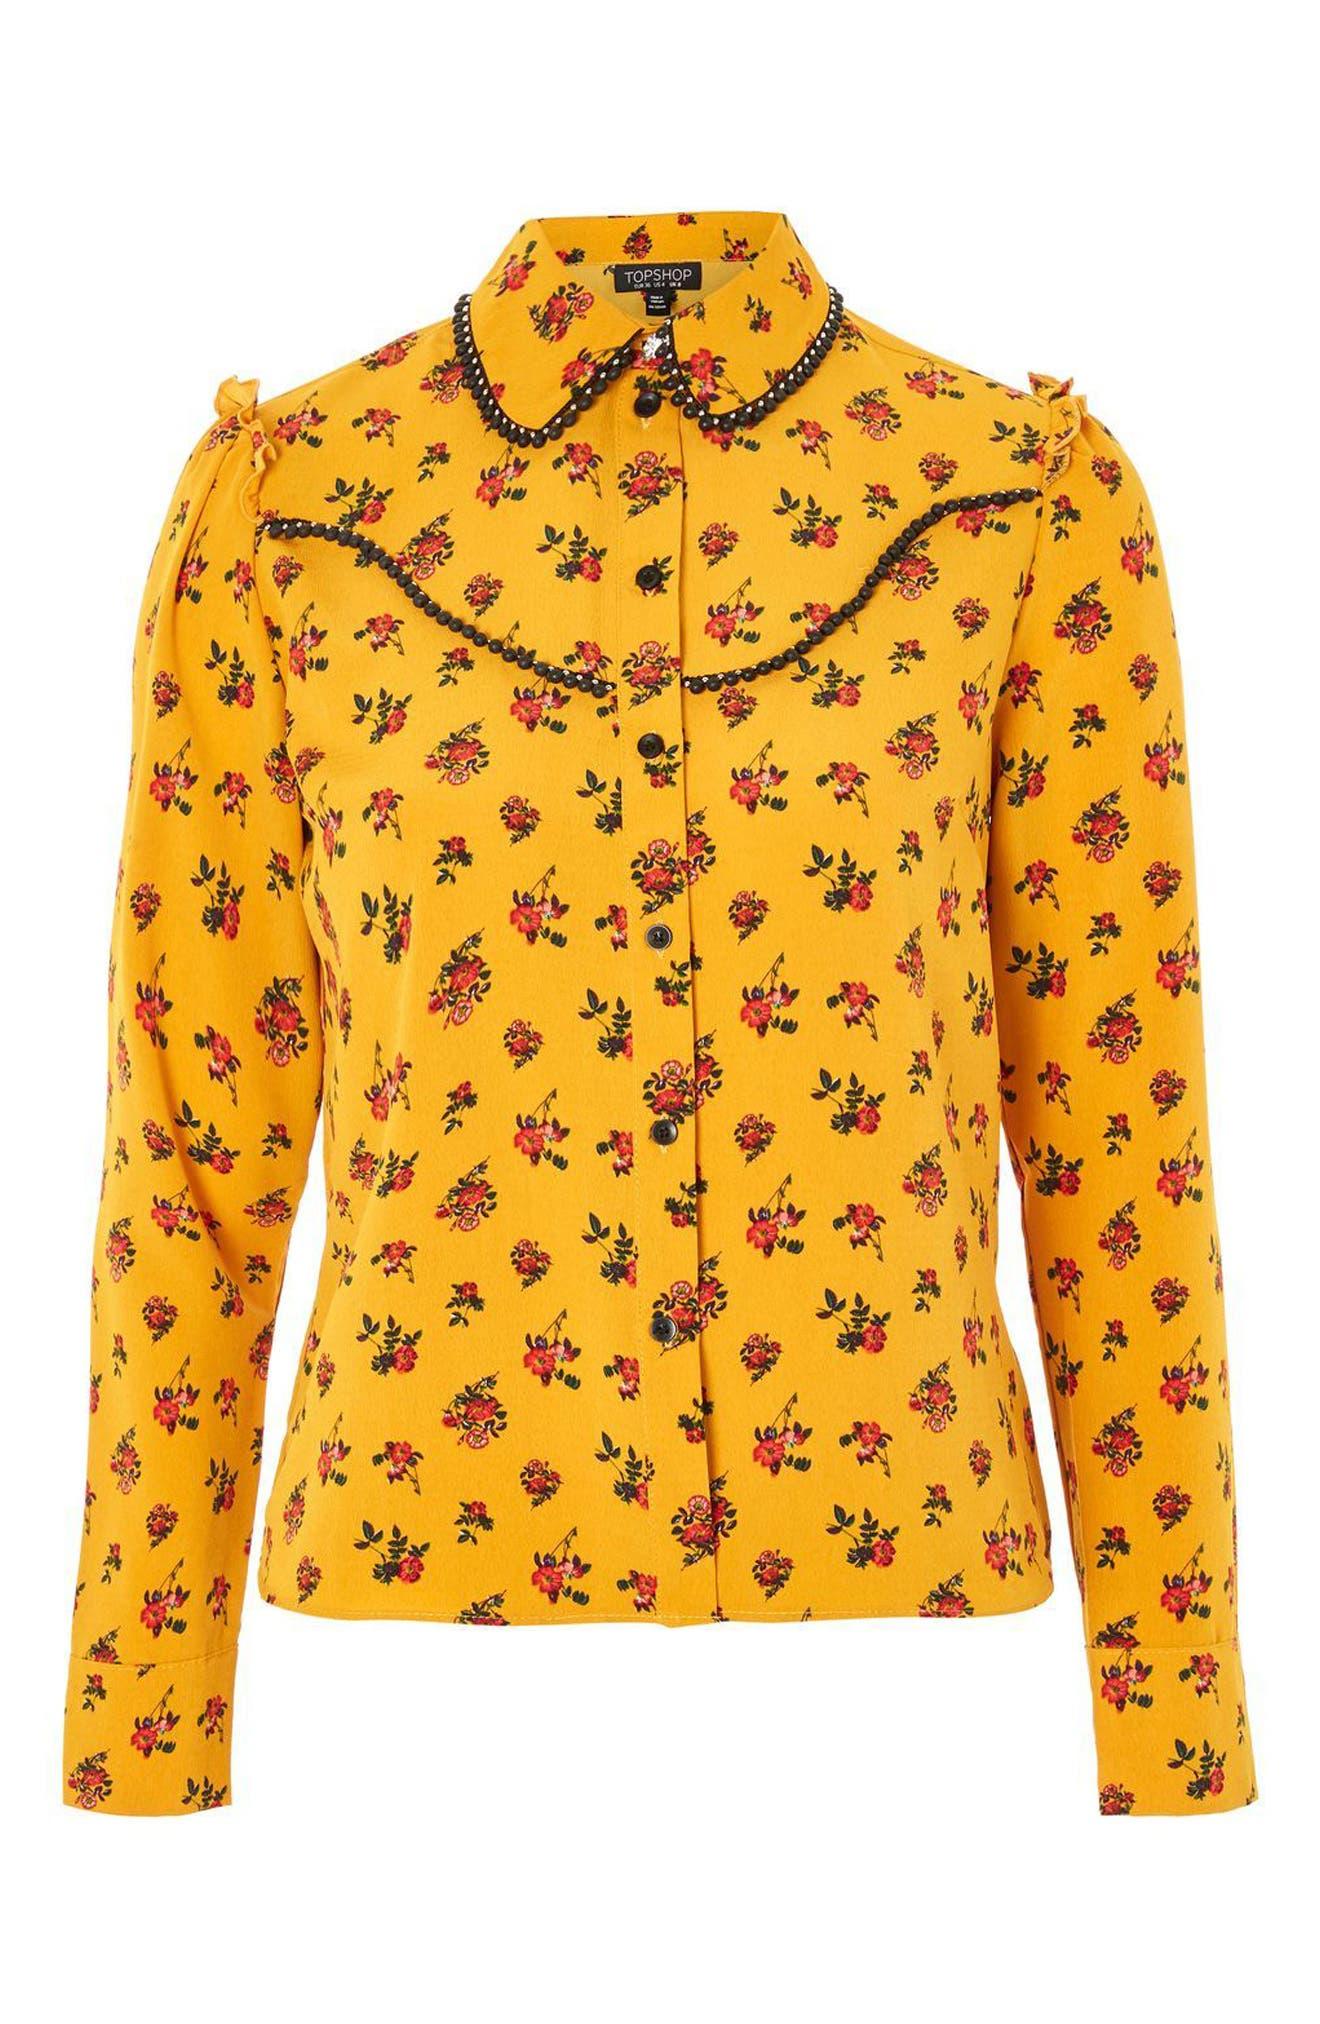 Rodeo Floral Retro Shirt,                             Alternate thumbnail 4, color,                             Mustard